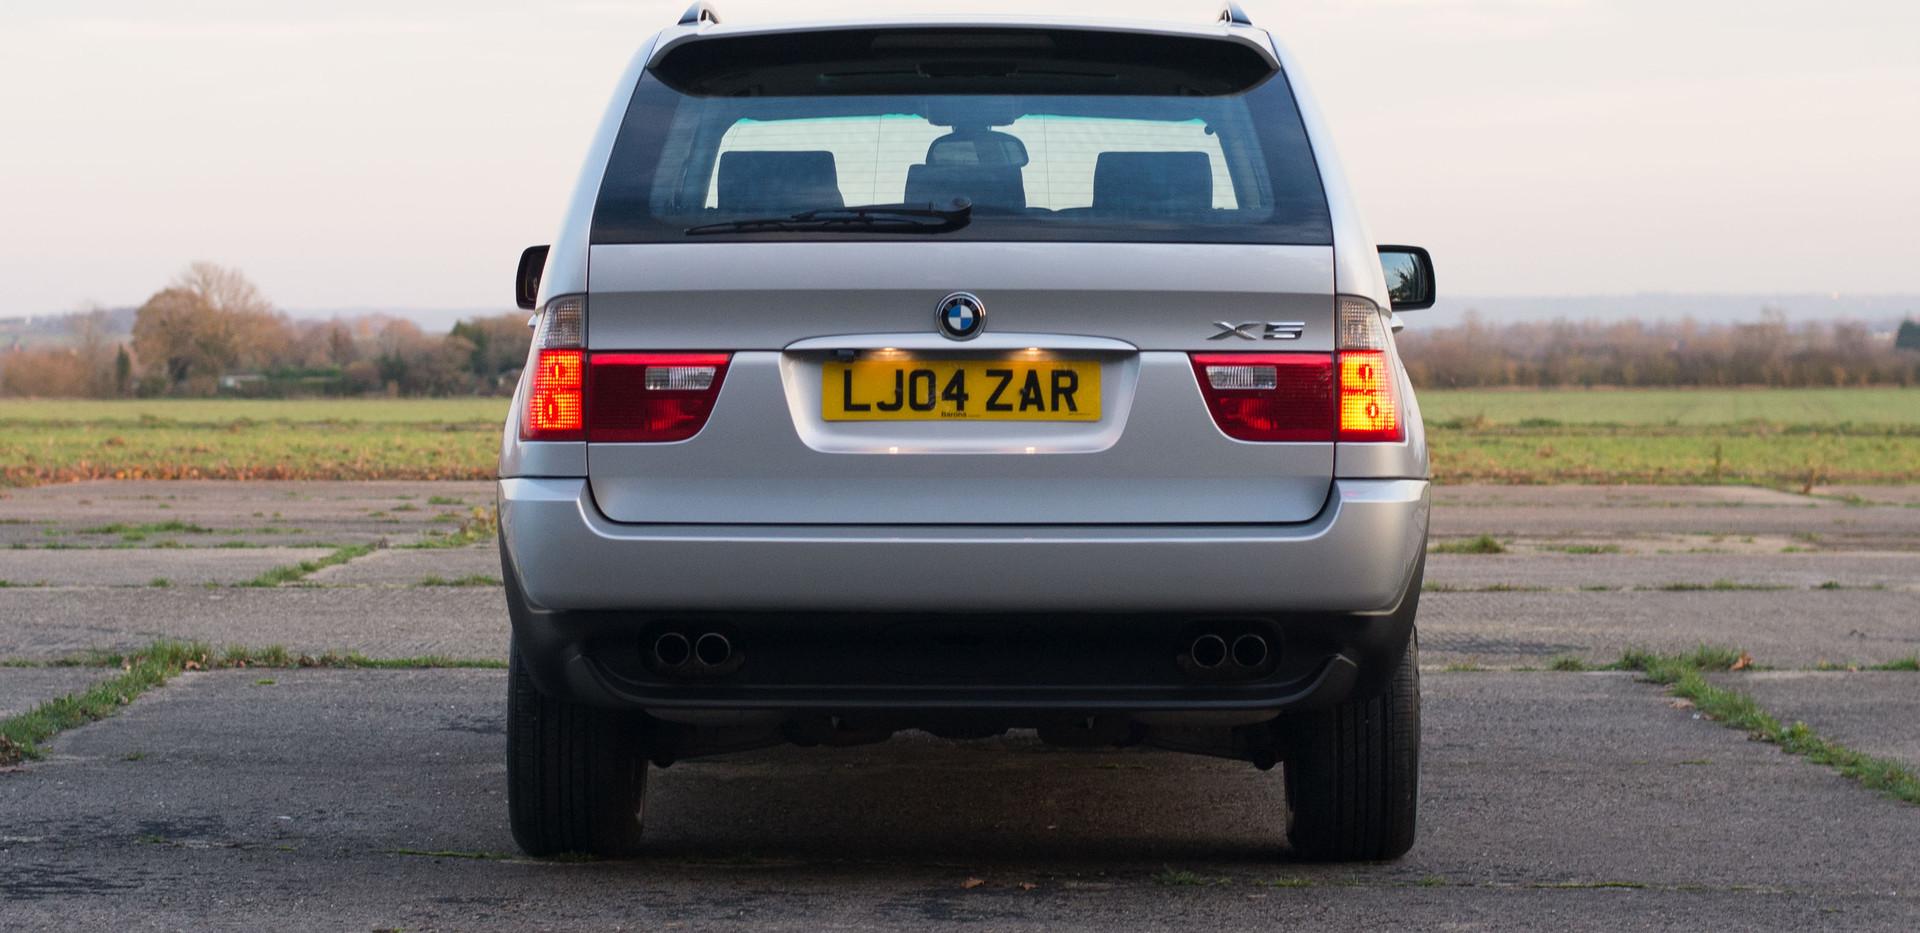 BMW E53 X5 4.4i For Sale UK London  (35